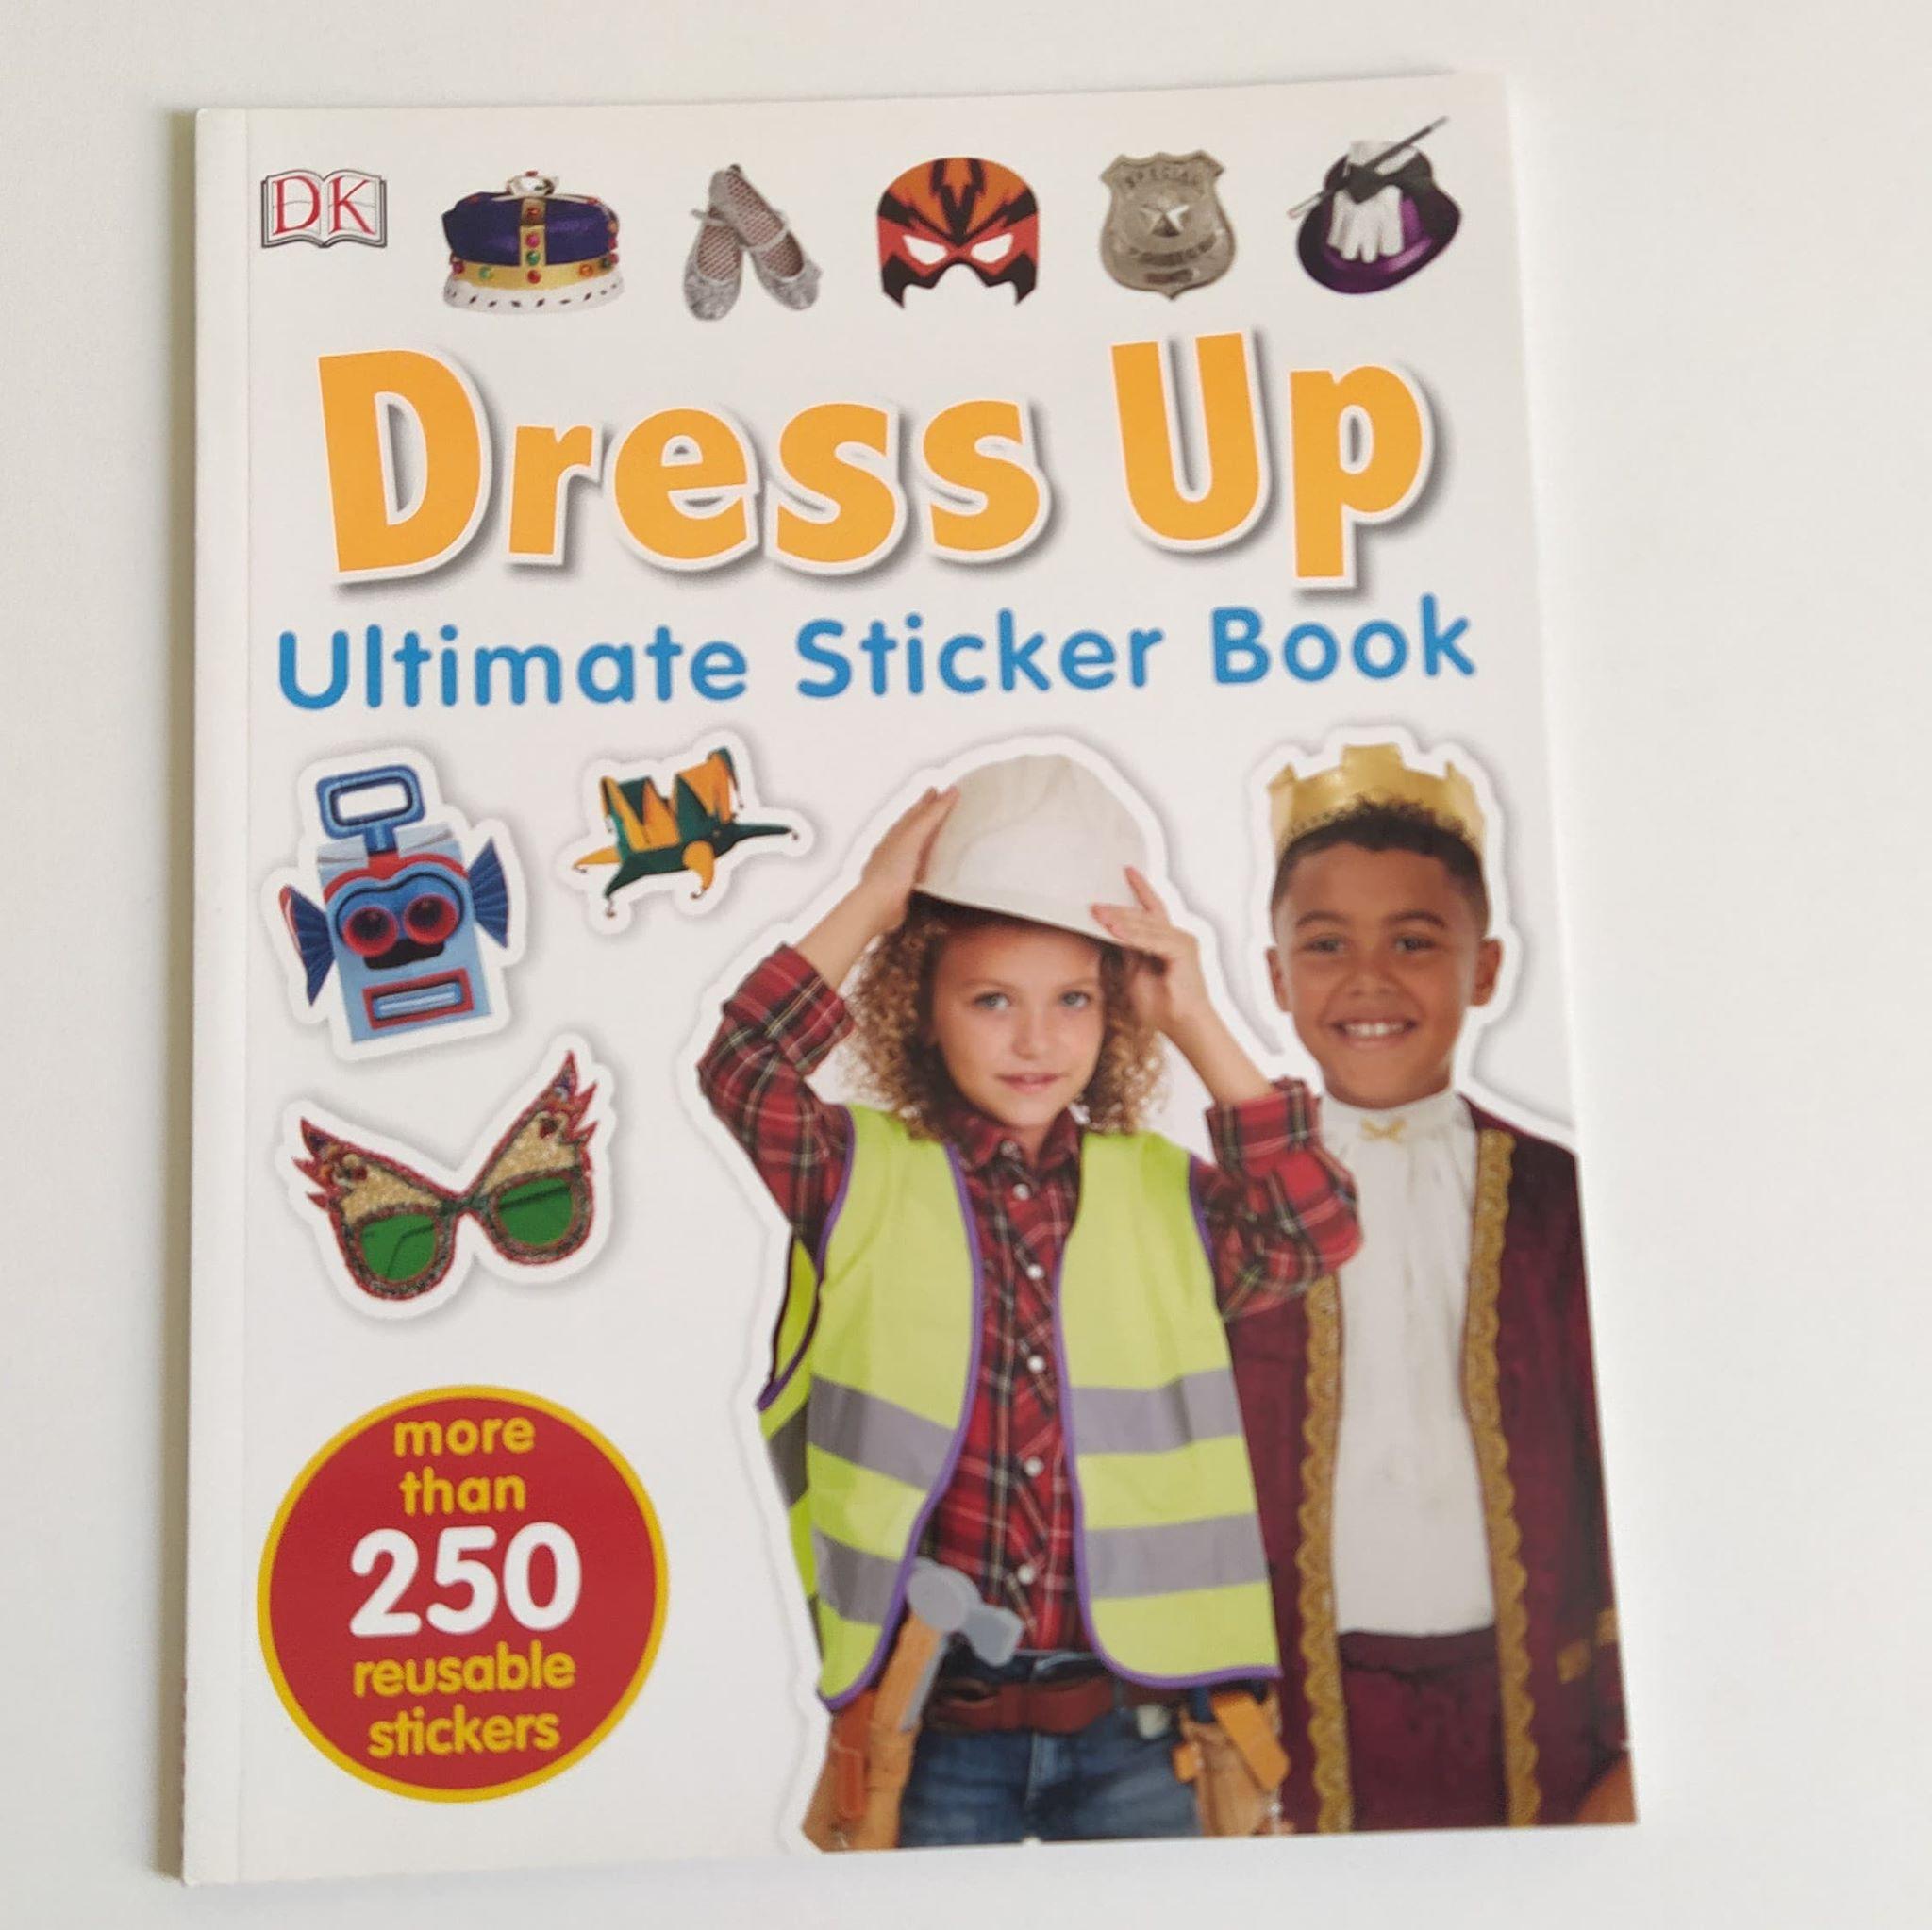 Dress Up Ultimate Sticker